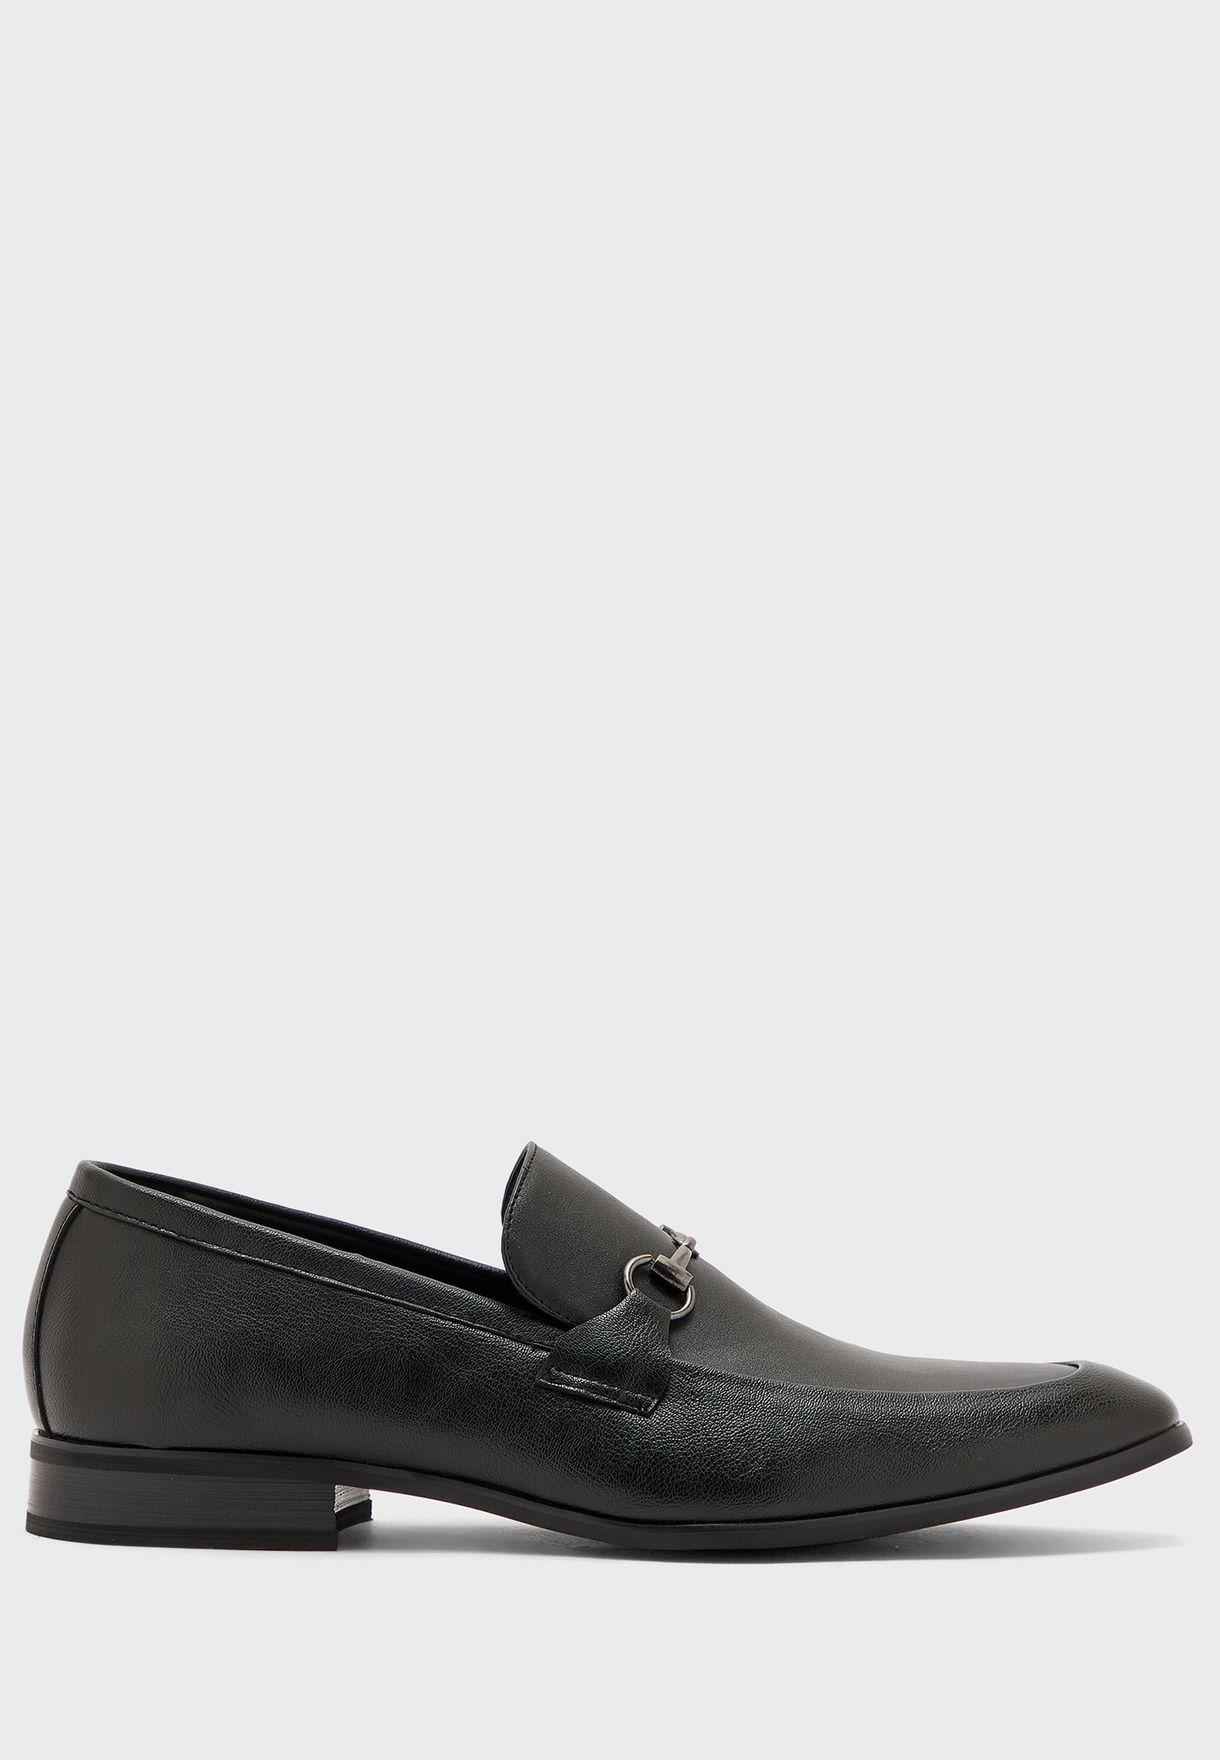 Horsebit Trim Formal Loafers